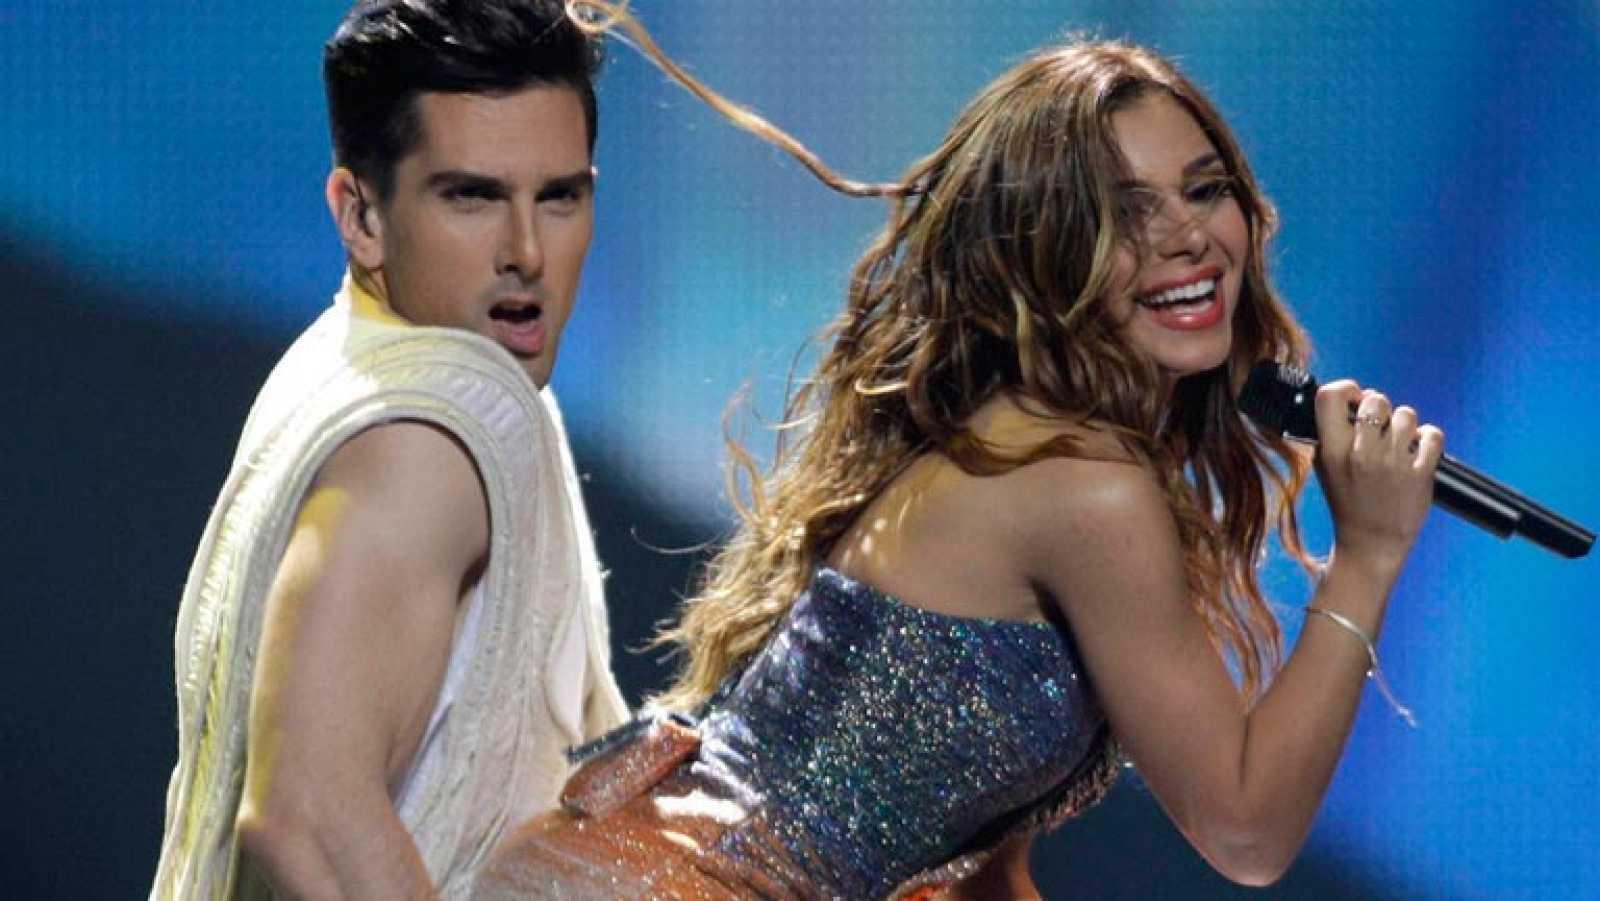 Image result for aphrodisiac eurovision